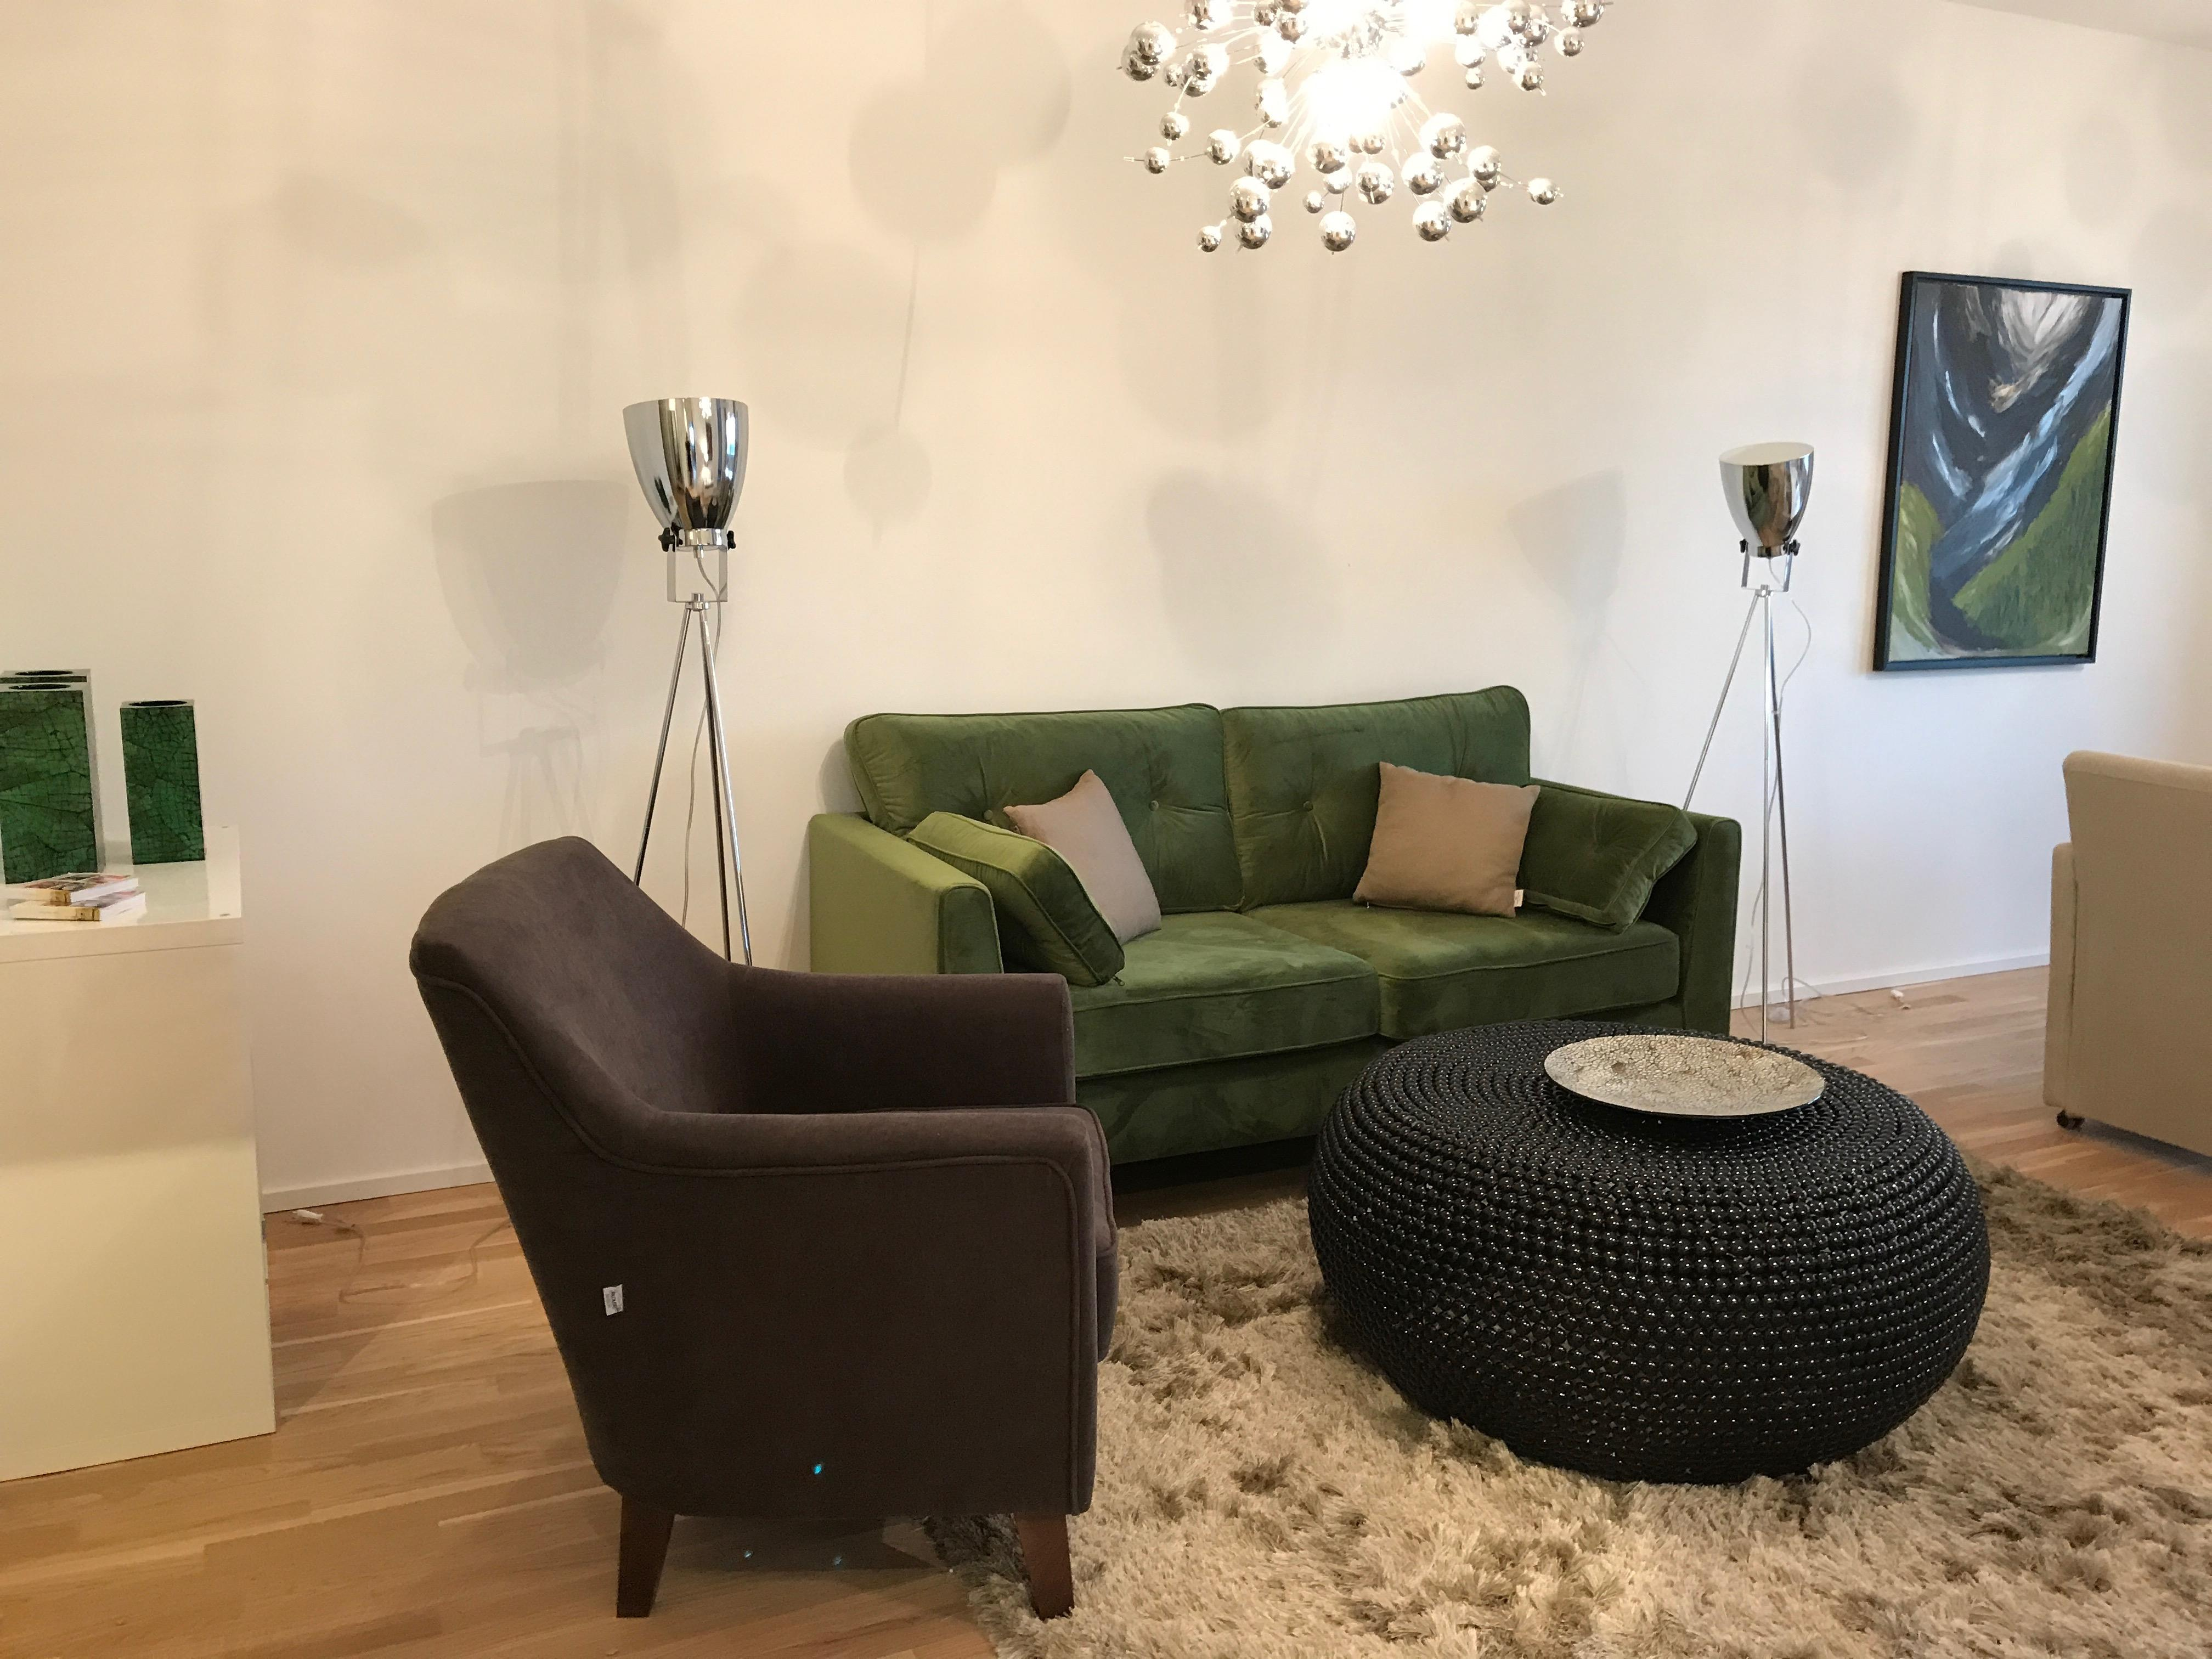 Grunes Sofa Bilder Ideen Couch